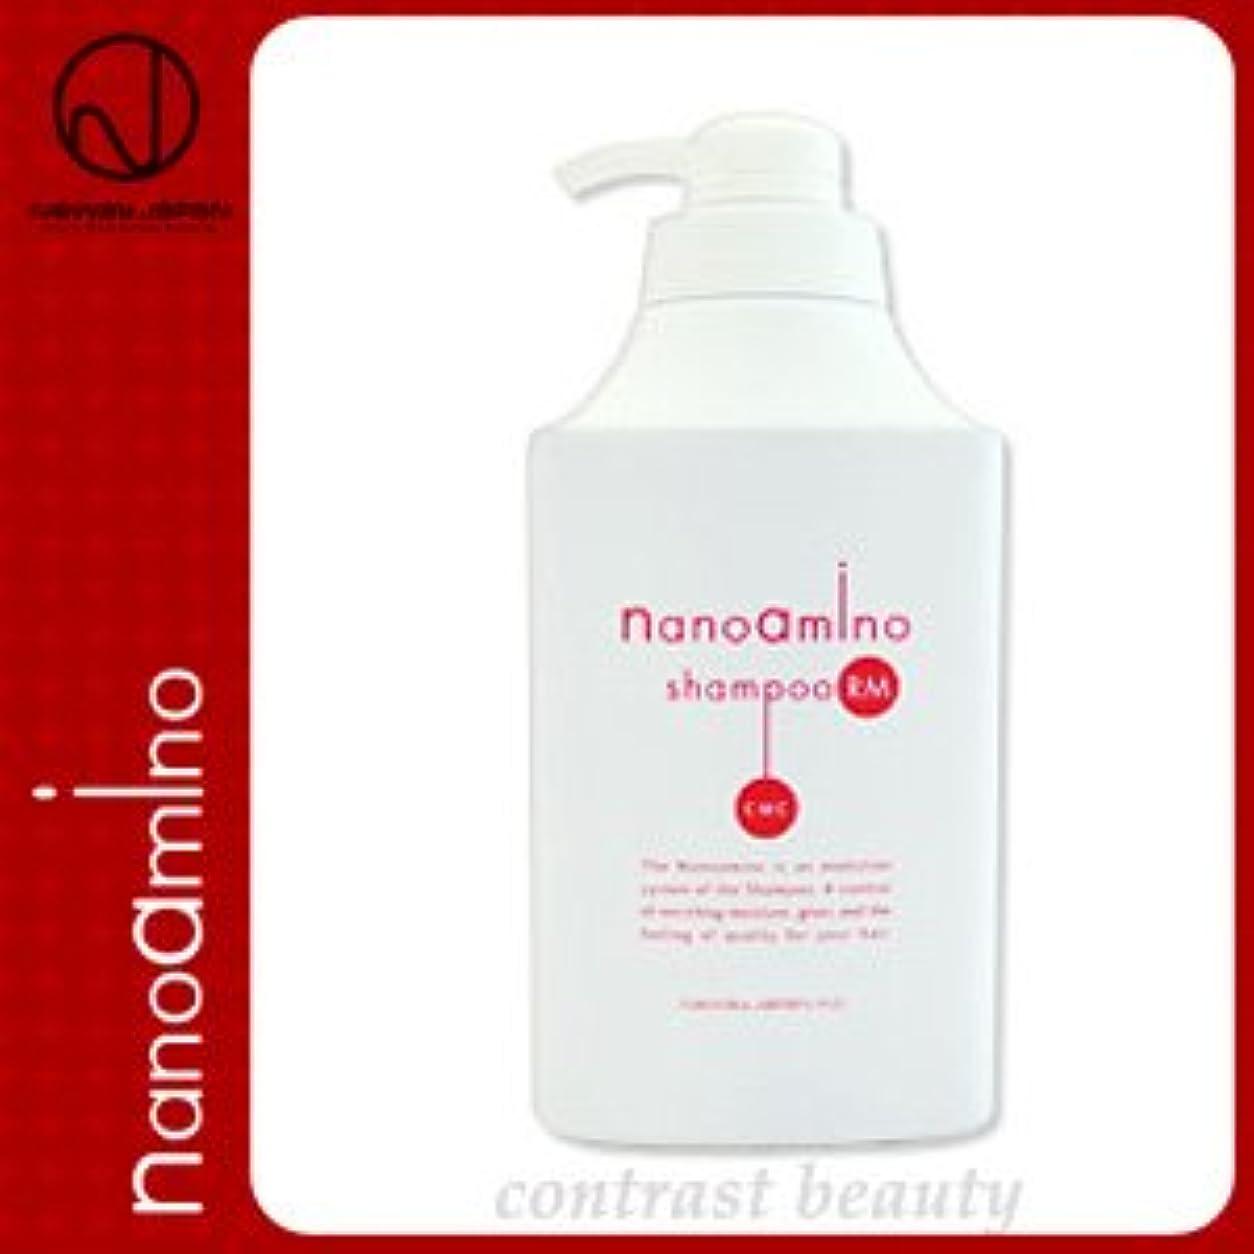 【X3個セット】 ニューウェイジャパン/NEWAY JAPAN ナノアミノ シャンプー RM 1000ml ポンプ付き容器入り